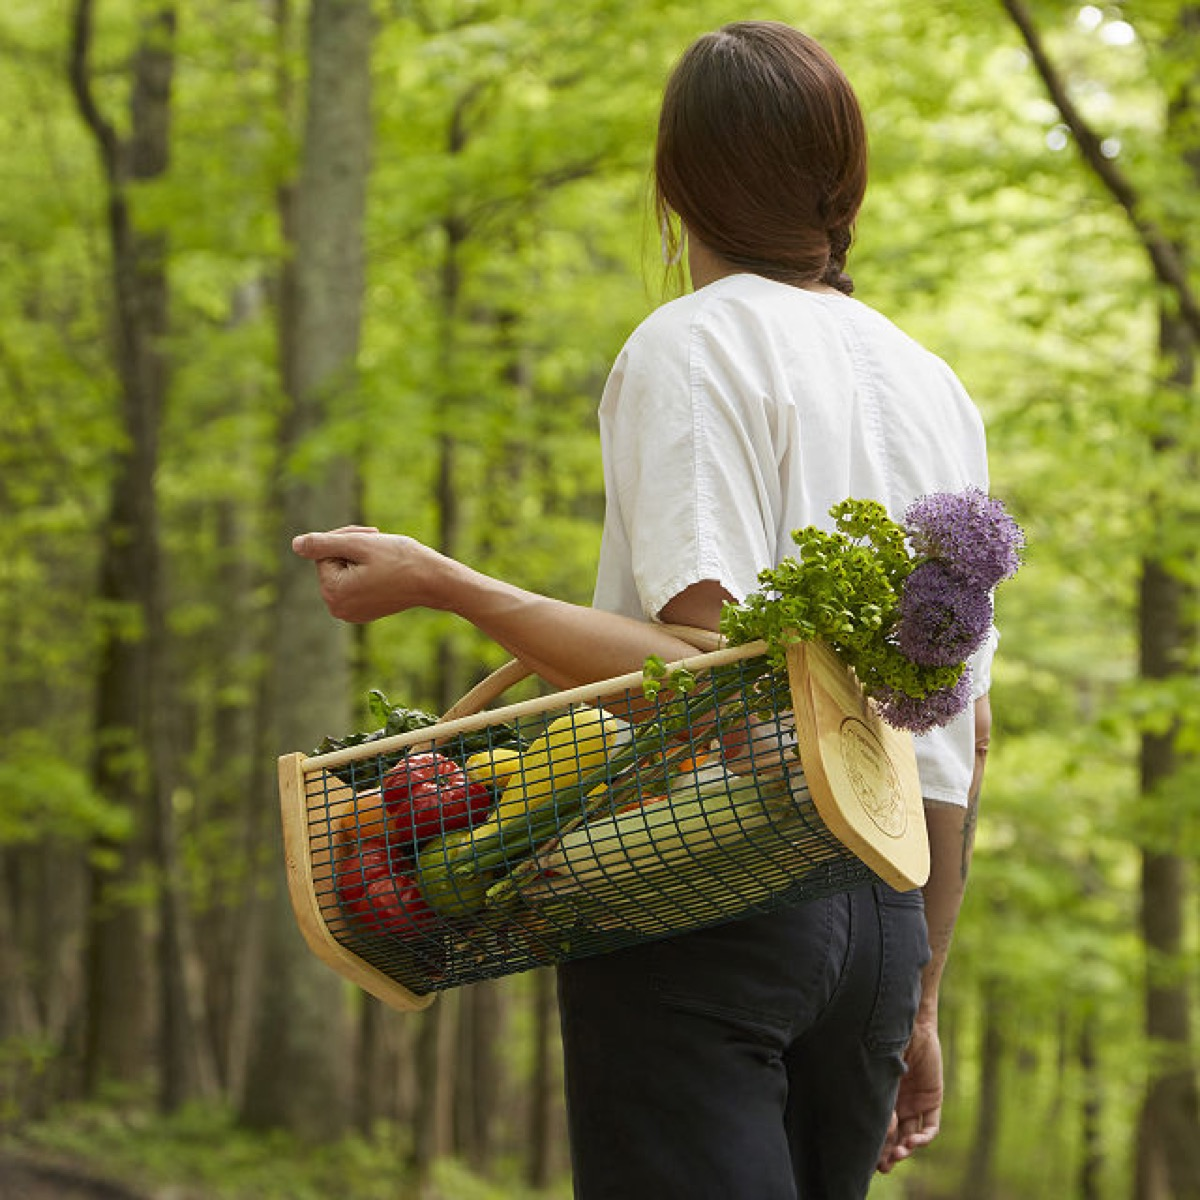 woman carrying veggies in harvest basket